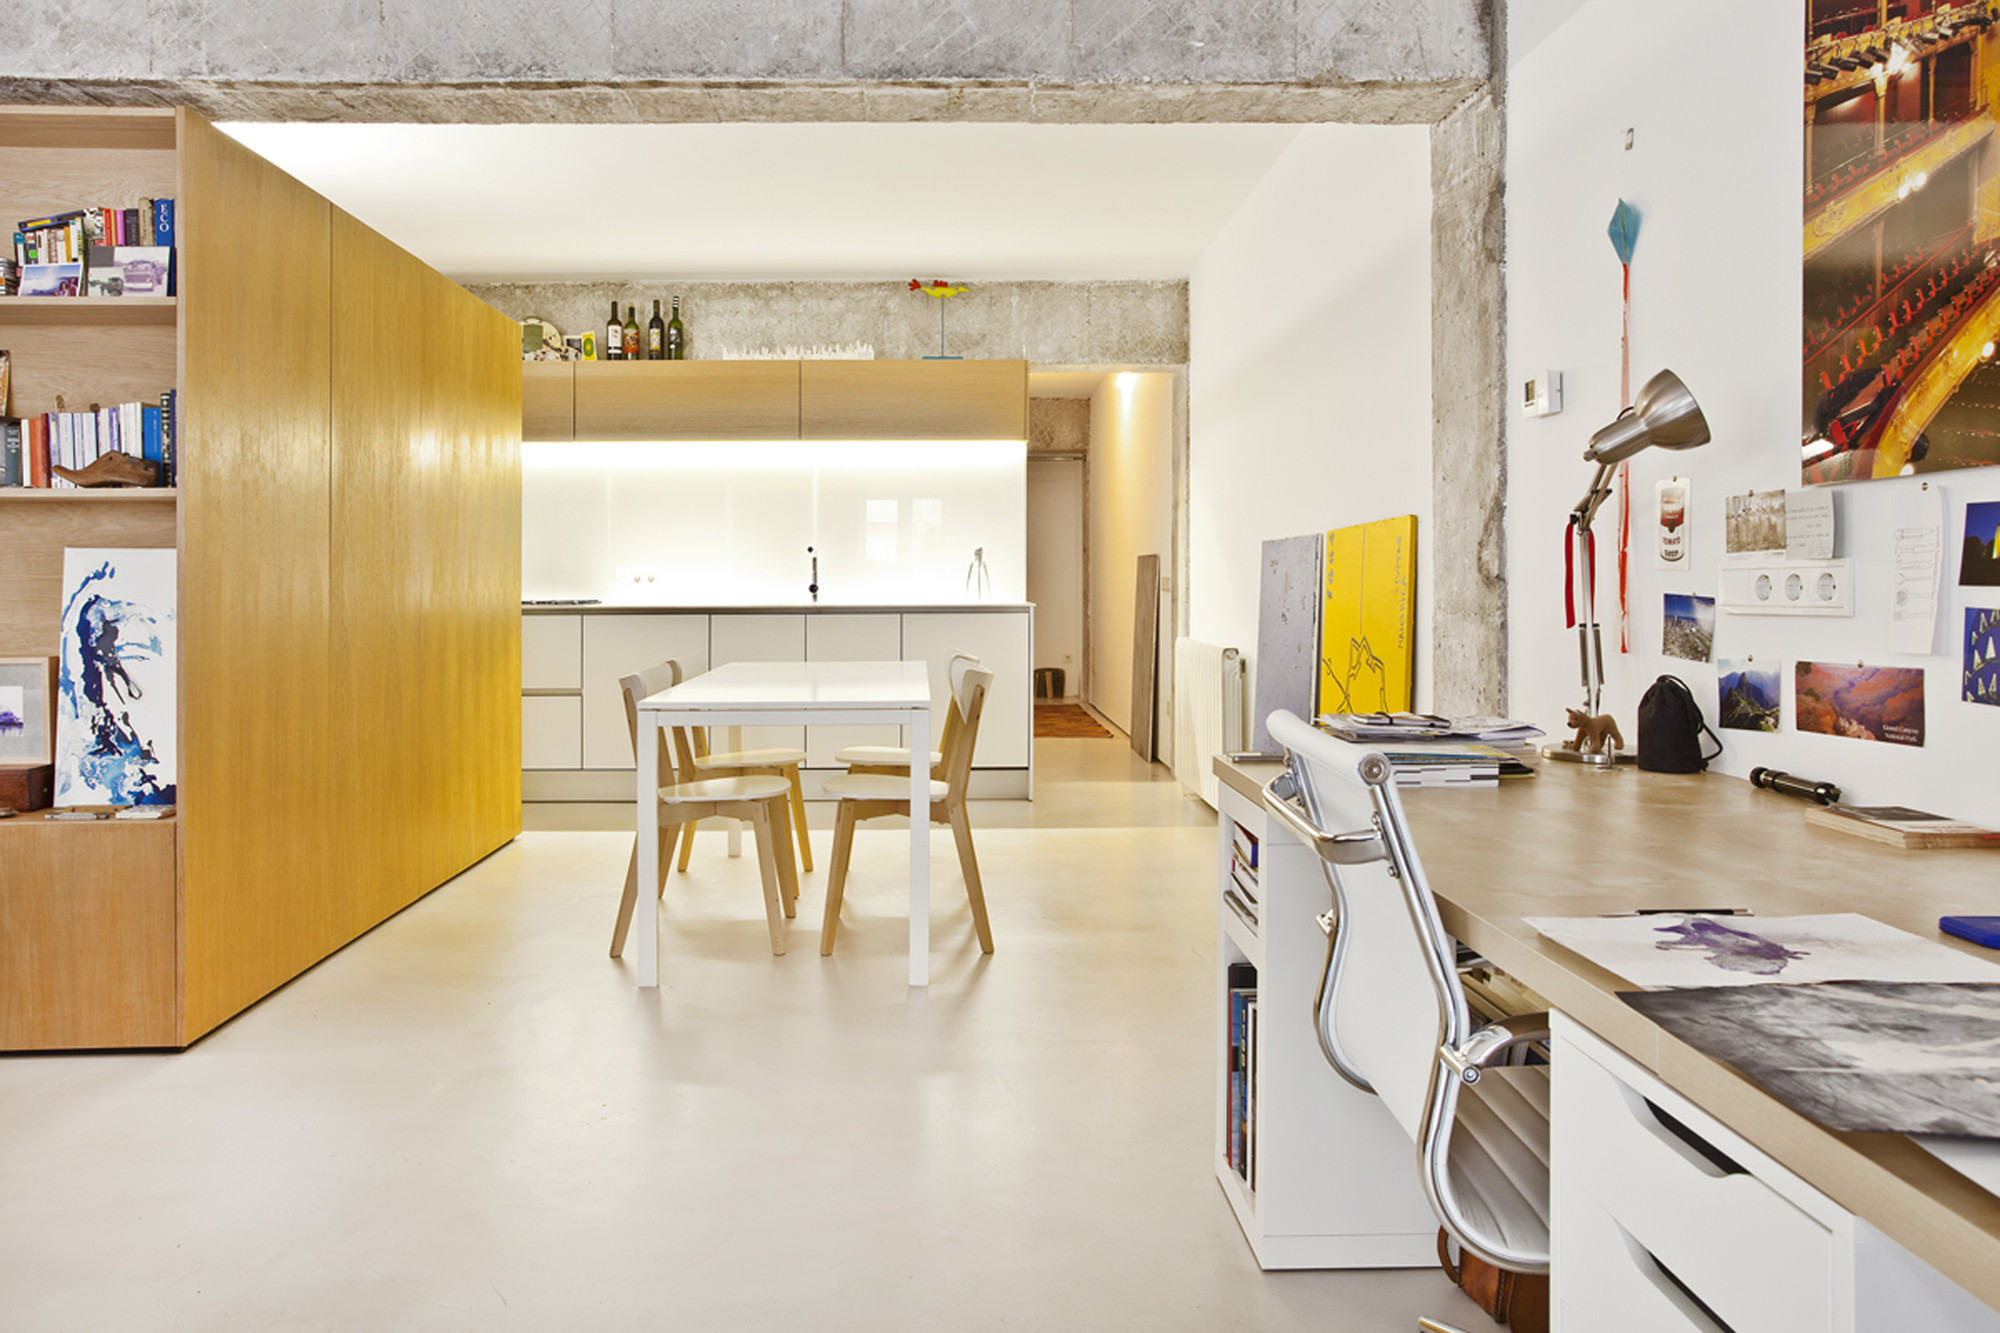 Galeria de reforma de apartamento em palma de mallorca vila segui arquitectos 14 - Arquitectos palma de mallorca ...